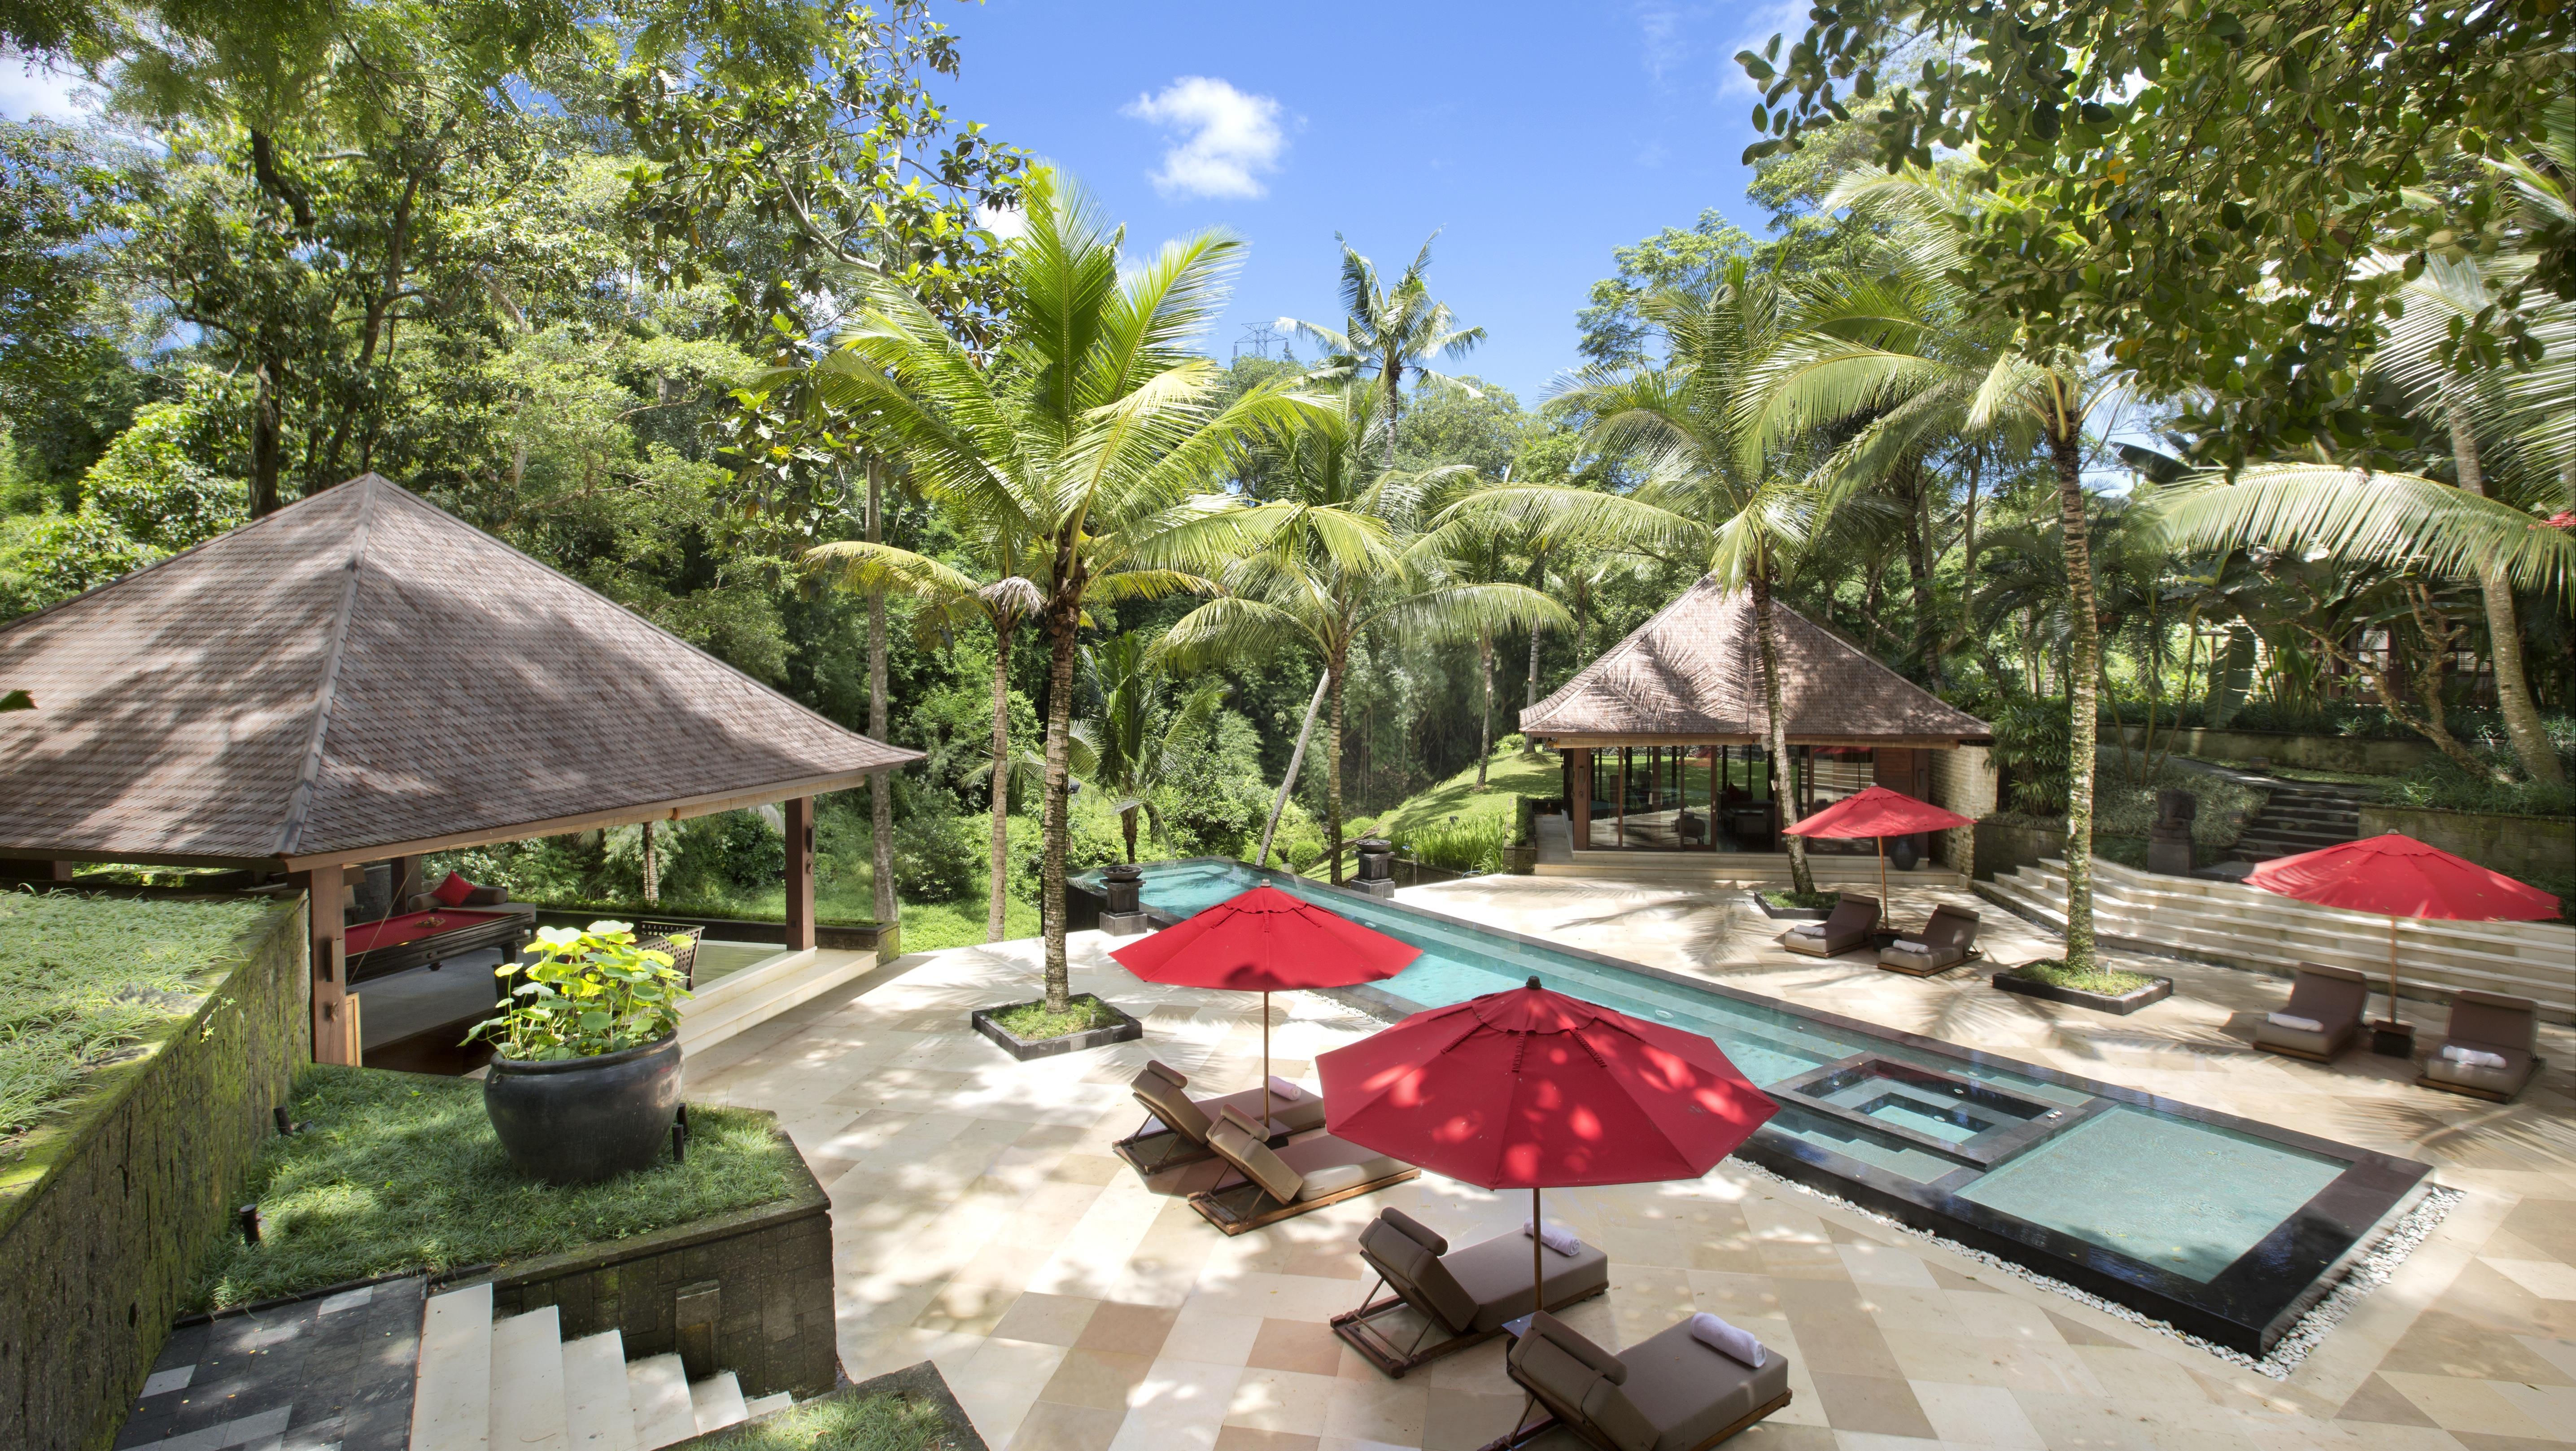 Reclining Sun Loungers - The Sanctuary Bali - Canggu, Bali